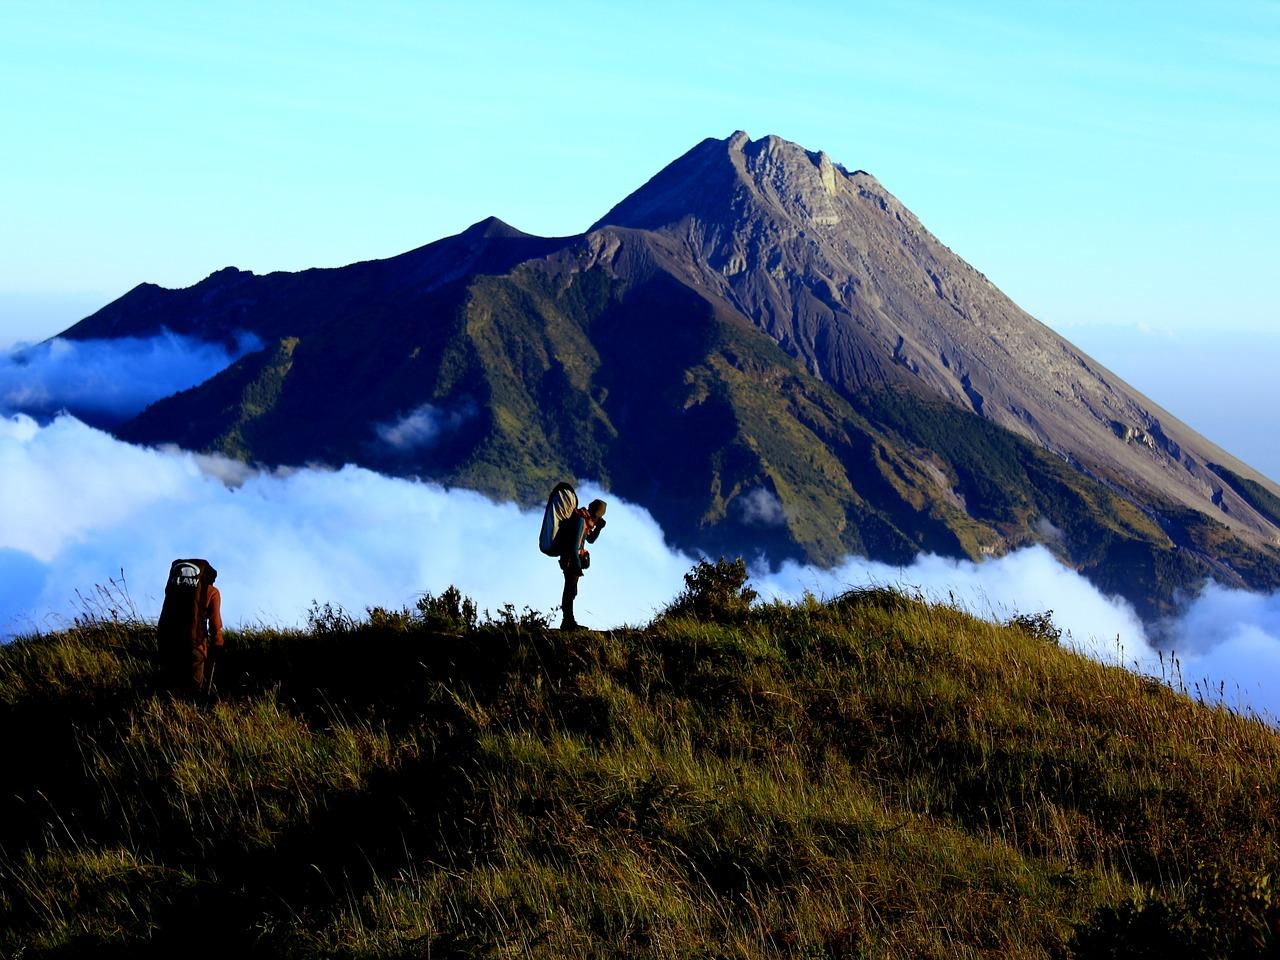 Вулкан мерапи, фото с сайта https://nashaplaneta.net/